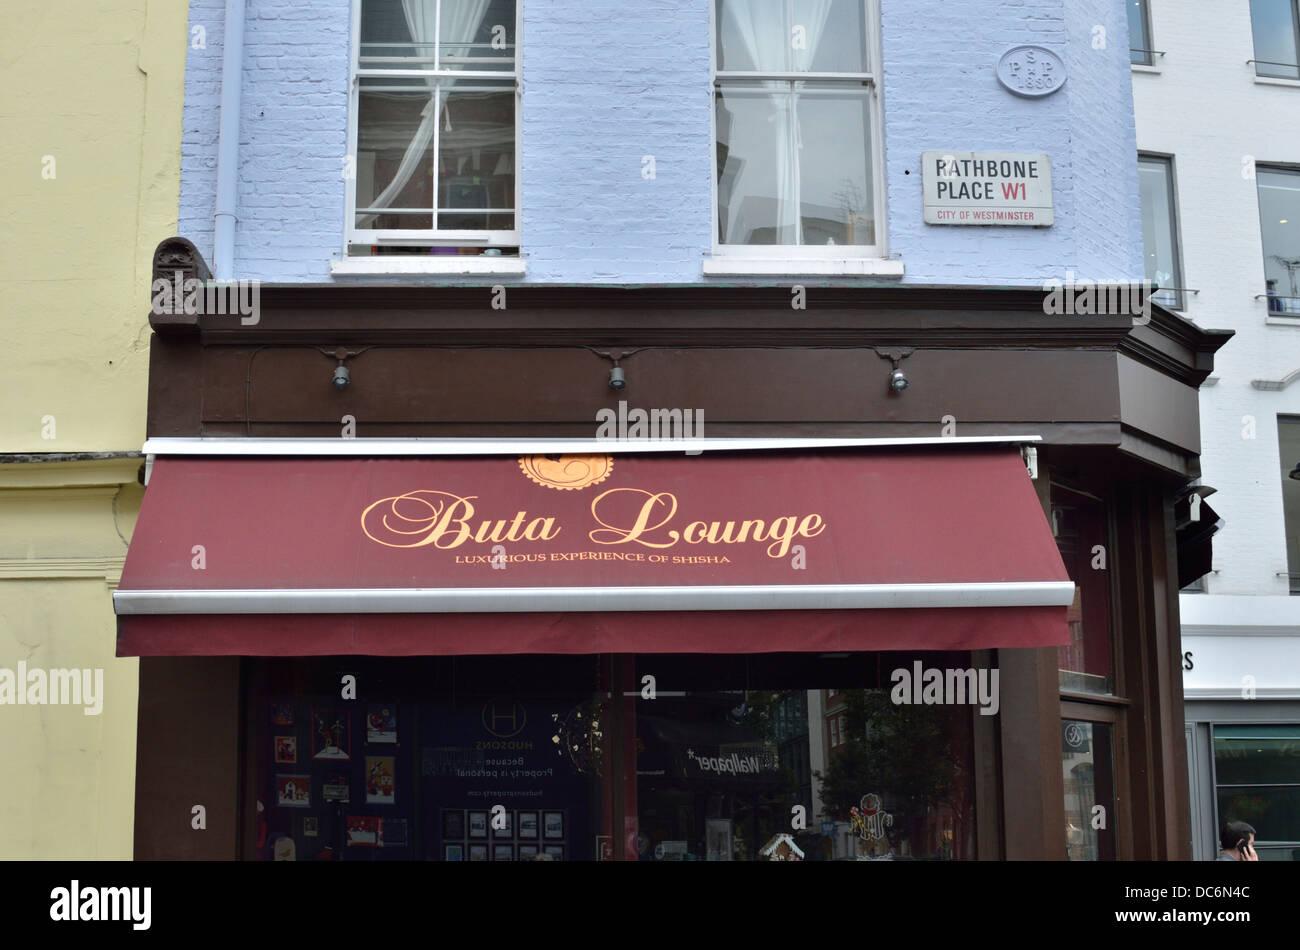 Buta Lounge, Azerbaijani shisha lounge bar and restaurant in Rathbone Place, Fitzrovia, London, UK. - Stock Image